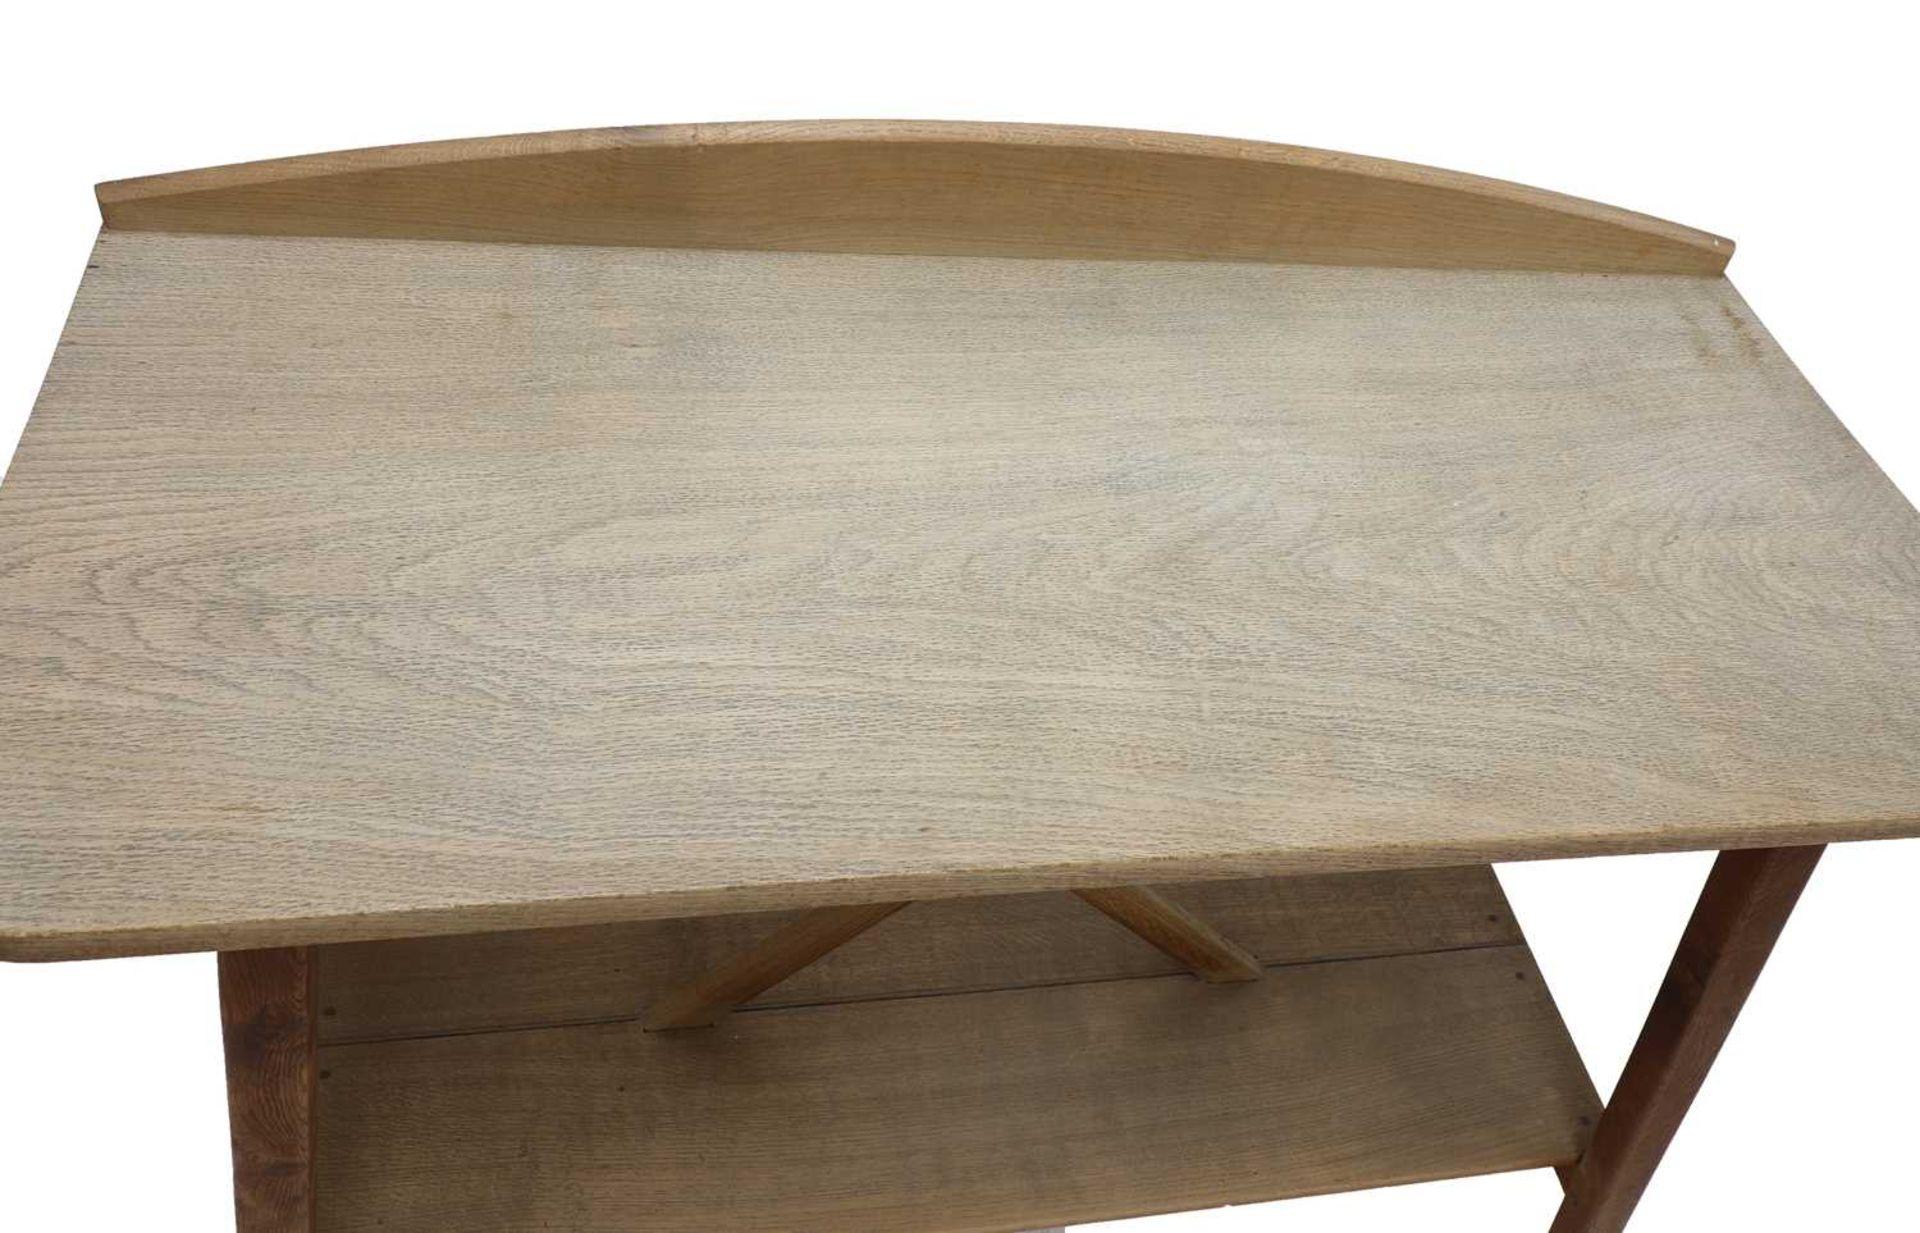 A Gordon Russell oak side table, - Image 3 of 3